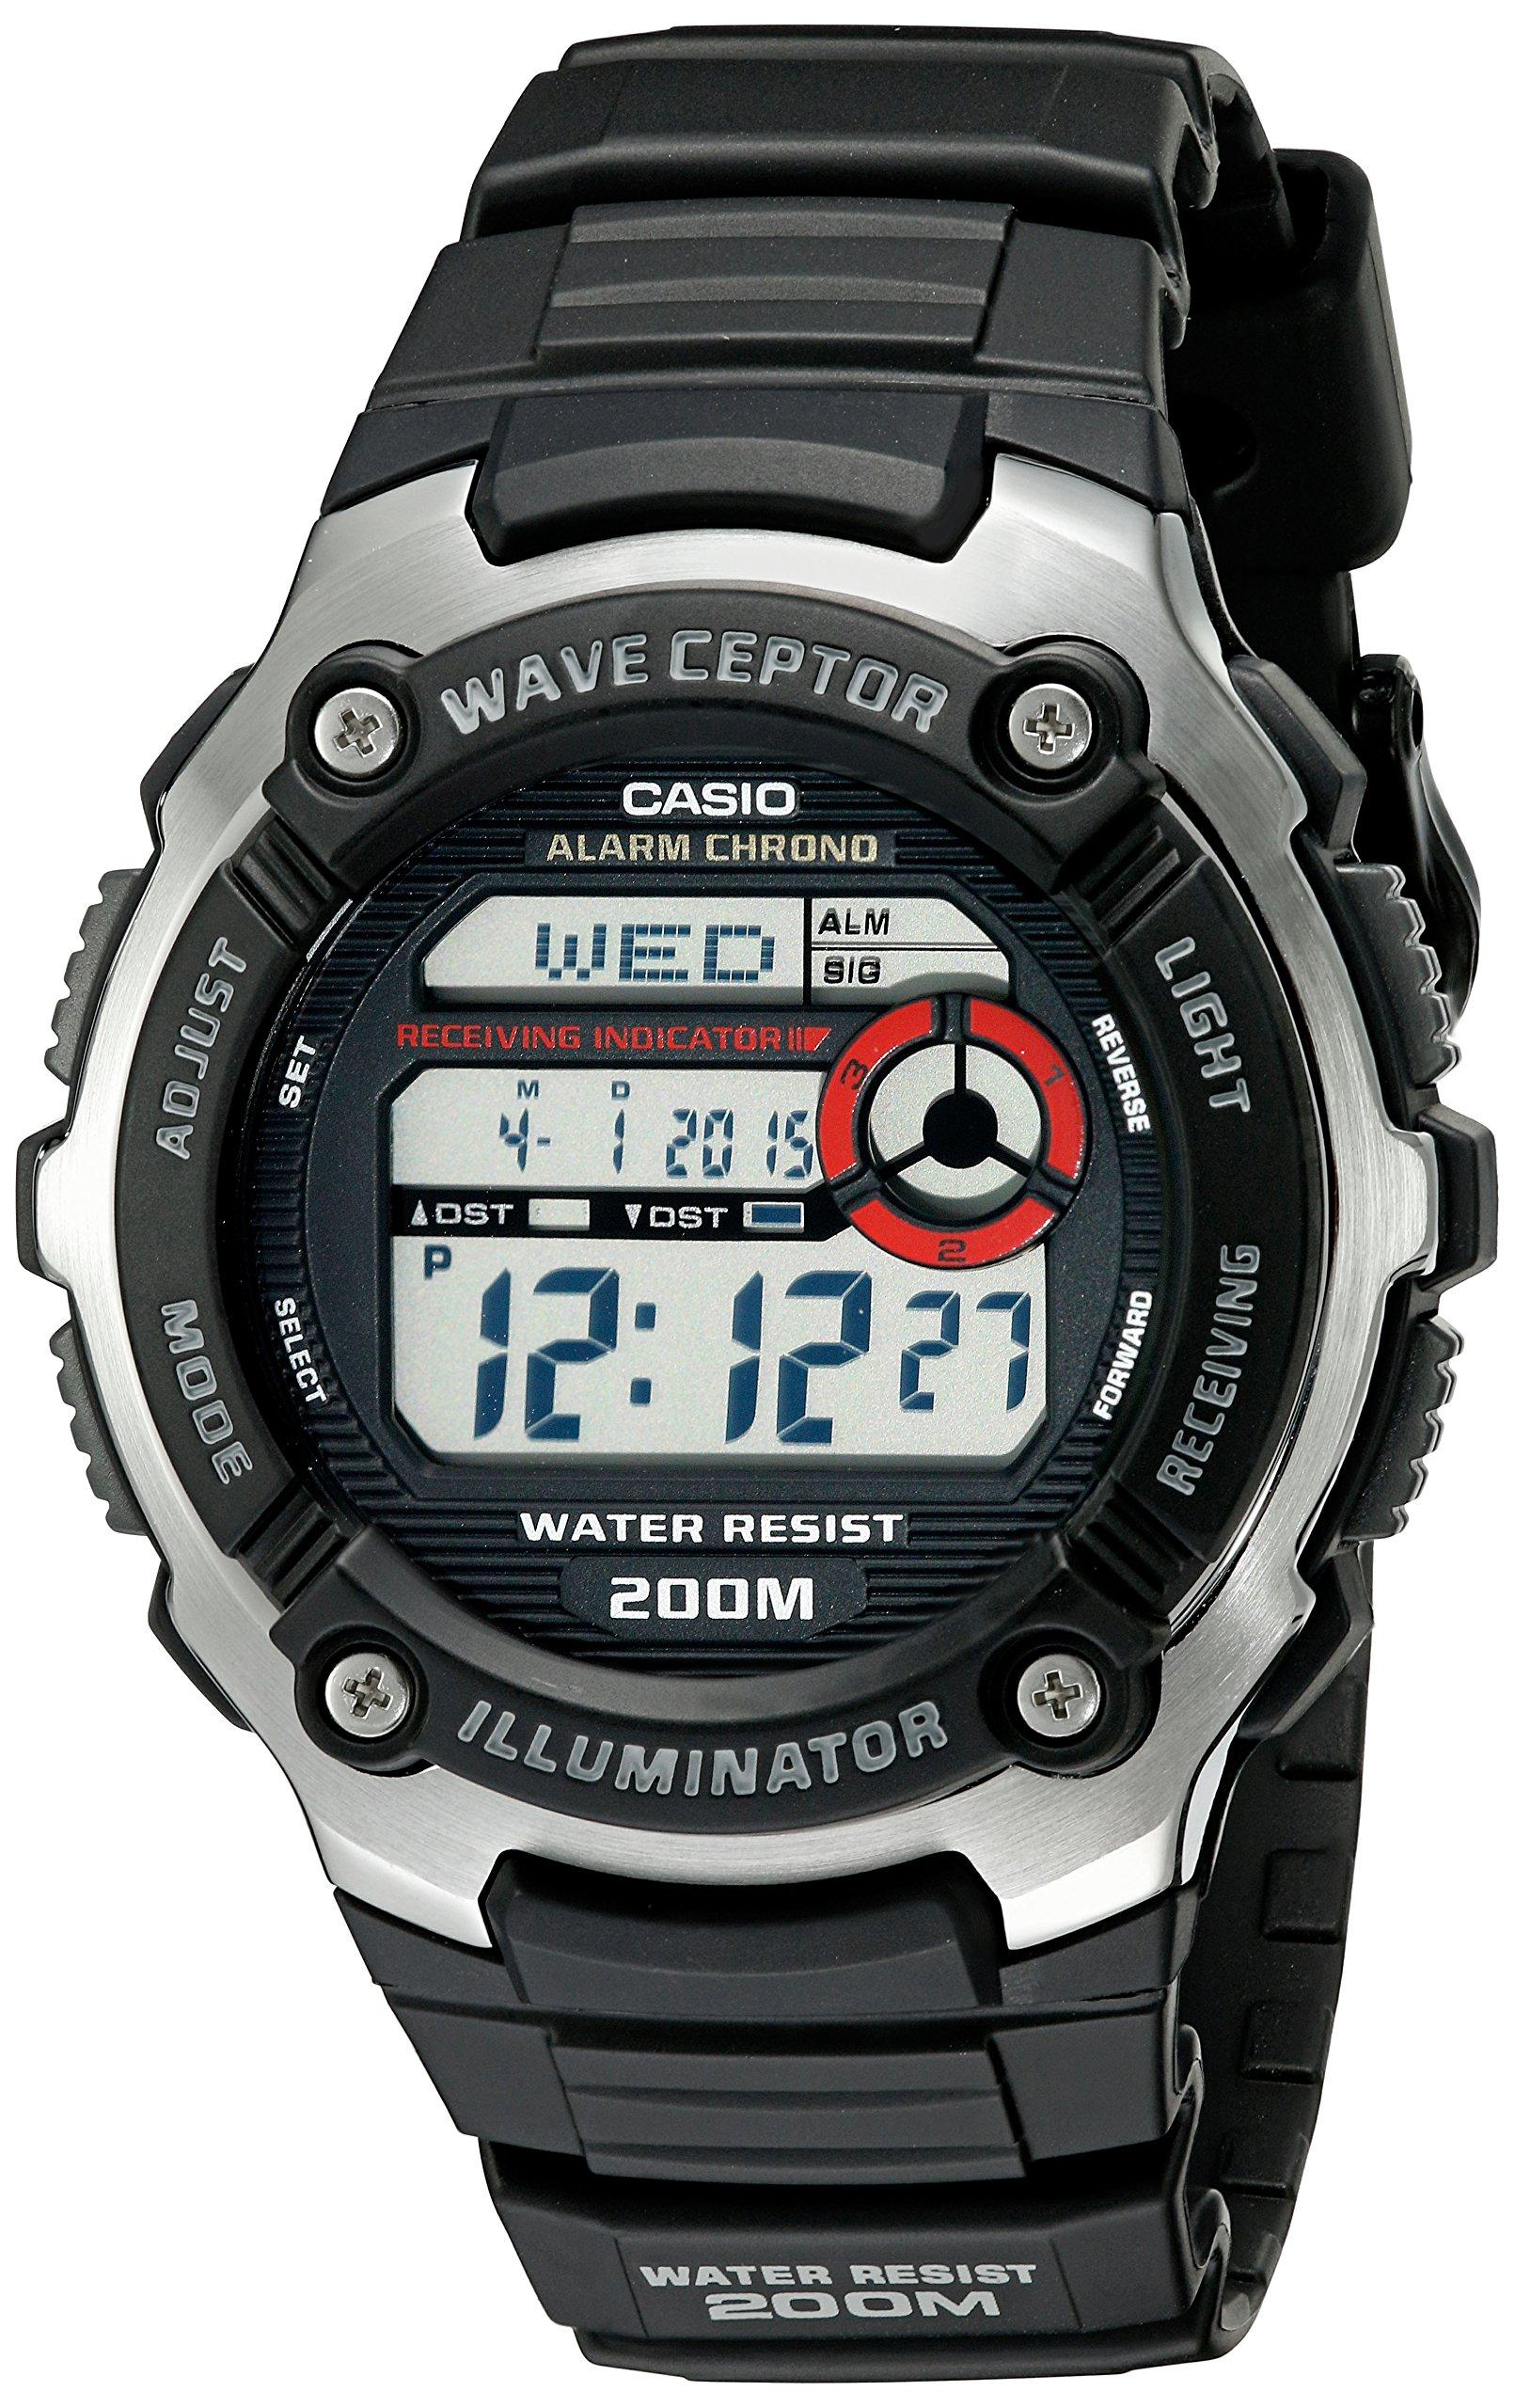 Casio Men's WV200A-1AV Waveceptor Watch with Black Band